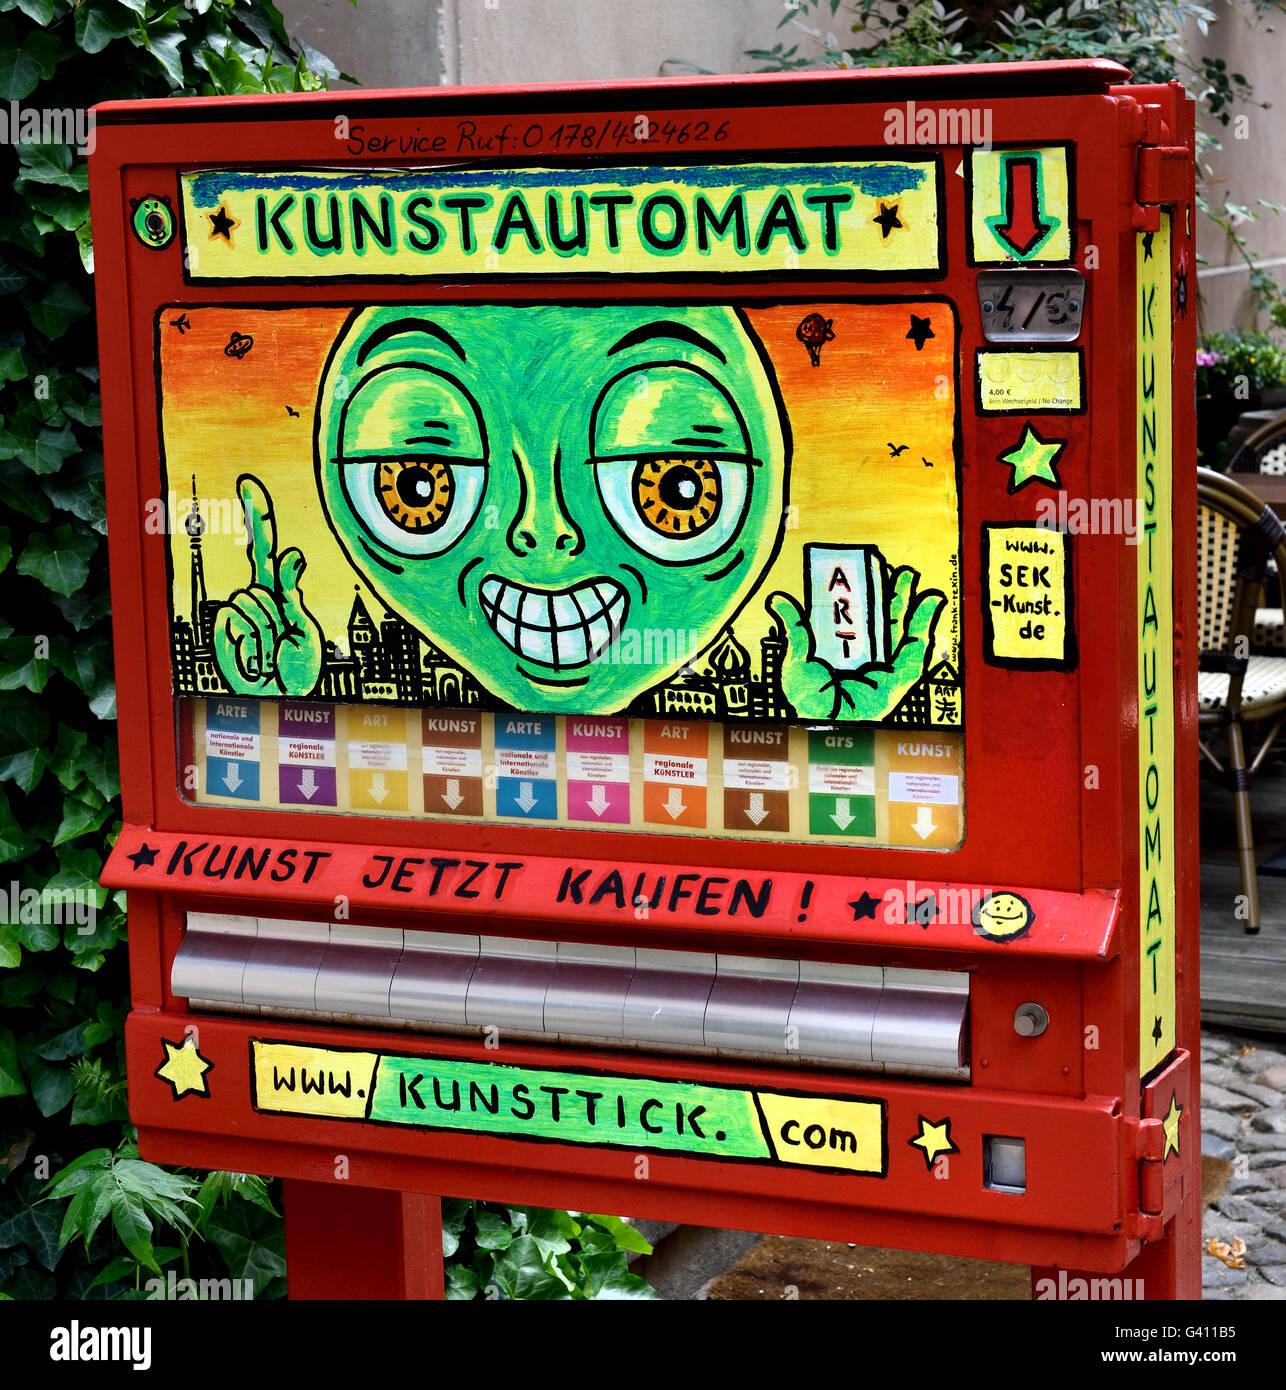 Kunstautomat Art Machine dispenser automate automatic area Scheunenviertel Berlin Germany - Stock Image